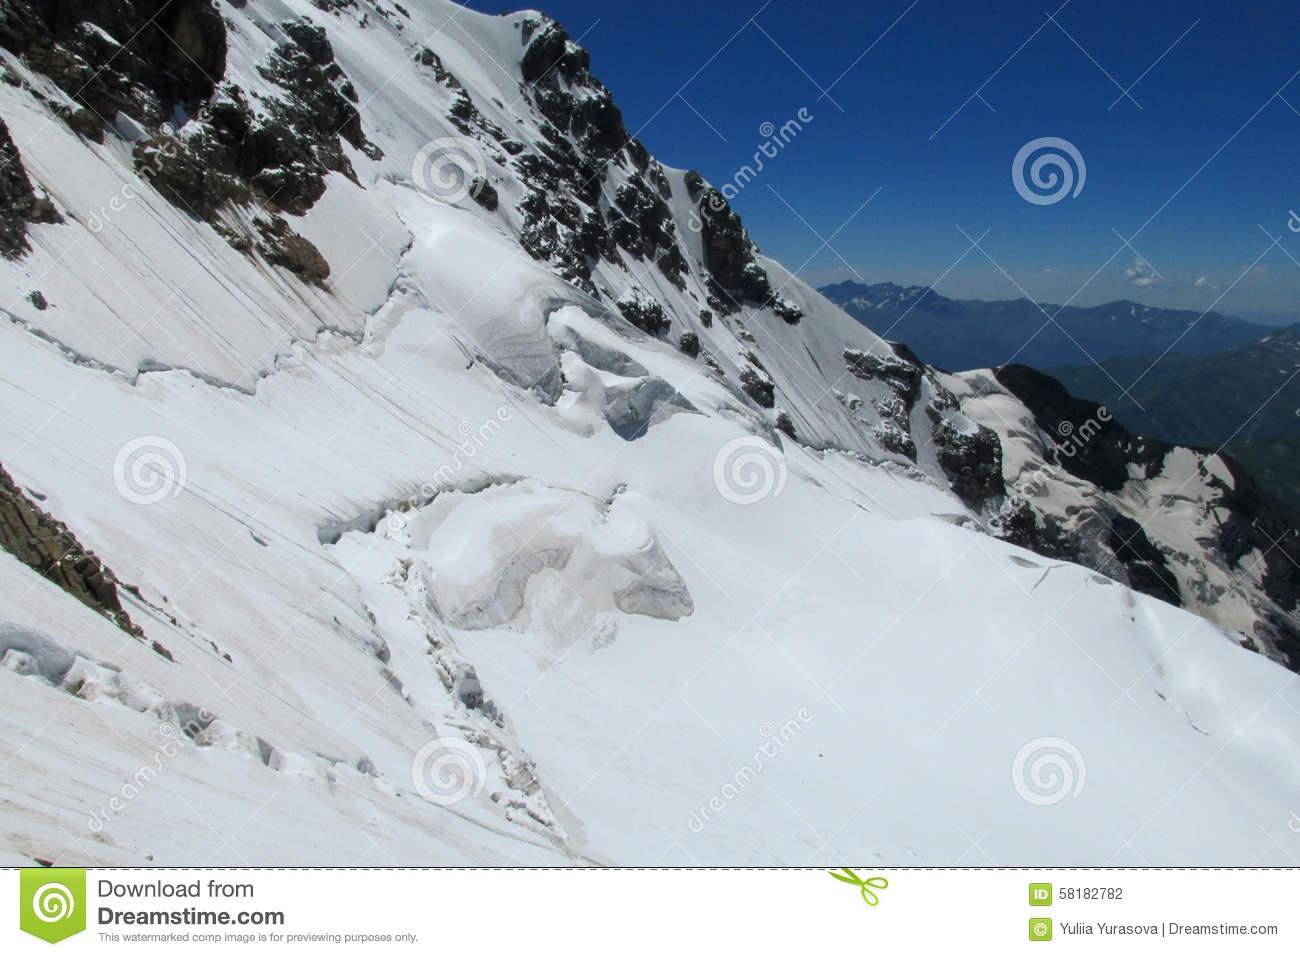 Bergschrund clipart #11